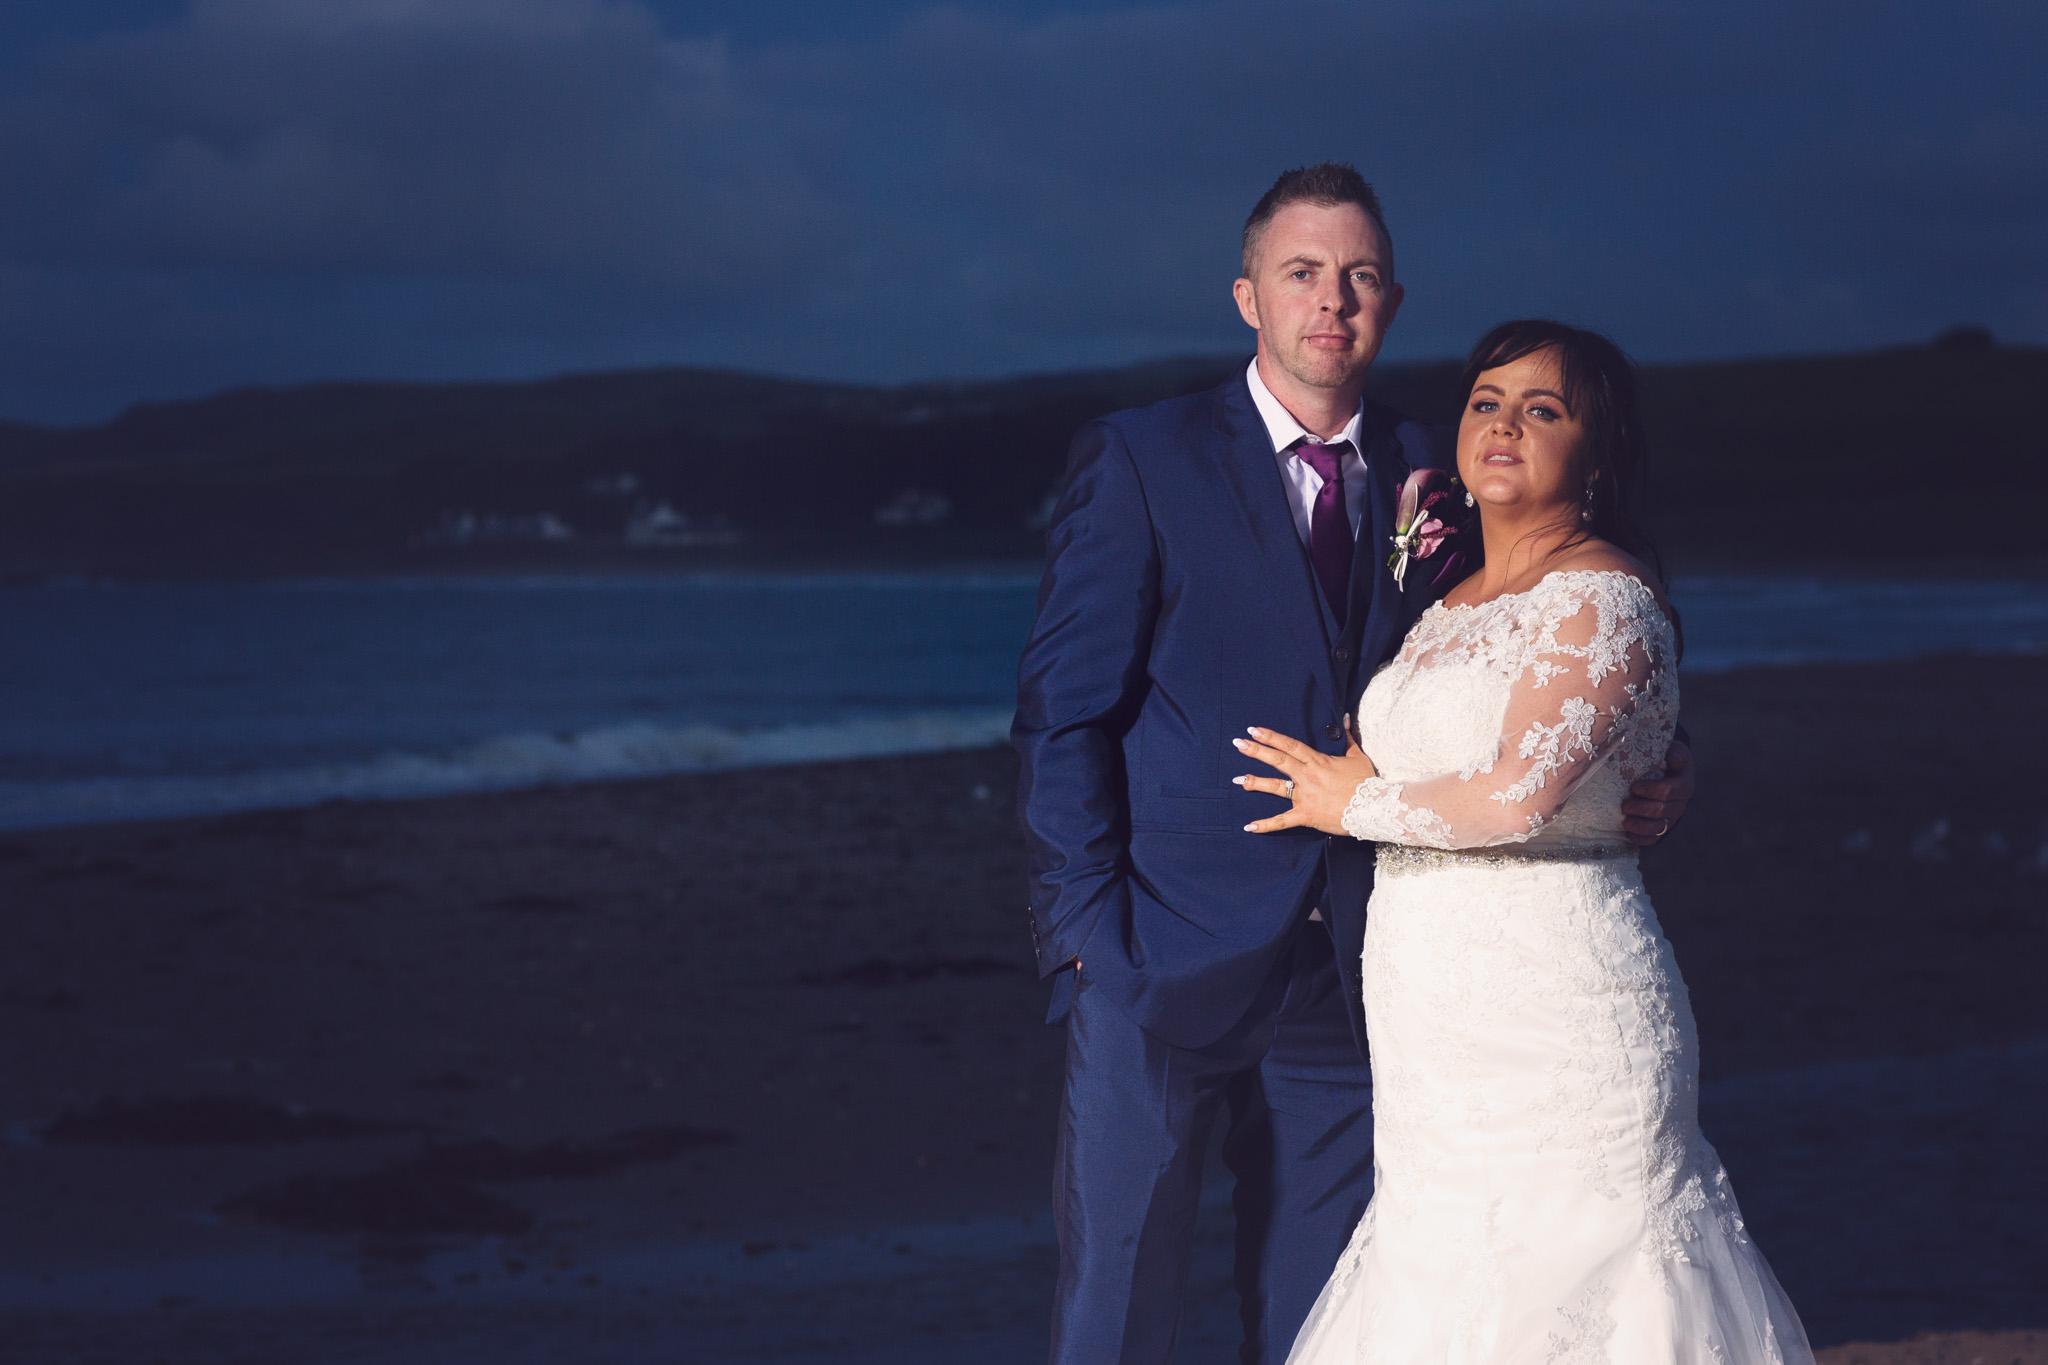 Mark_Barnes_Northern_Ireland_Wedding_Photography_Marine_hotel_ballycastle_Wedding_Photography_Janet&Darren-37.jpg